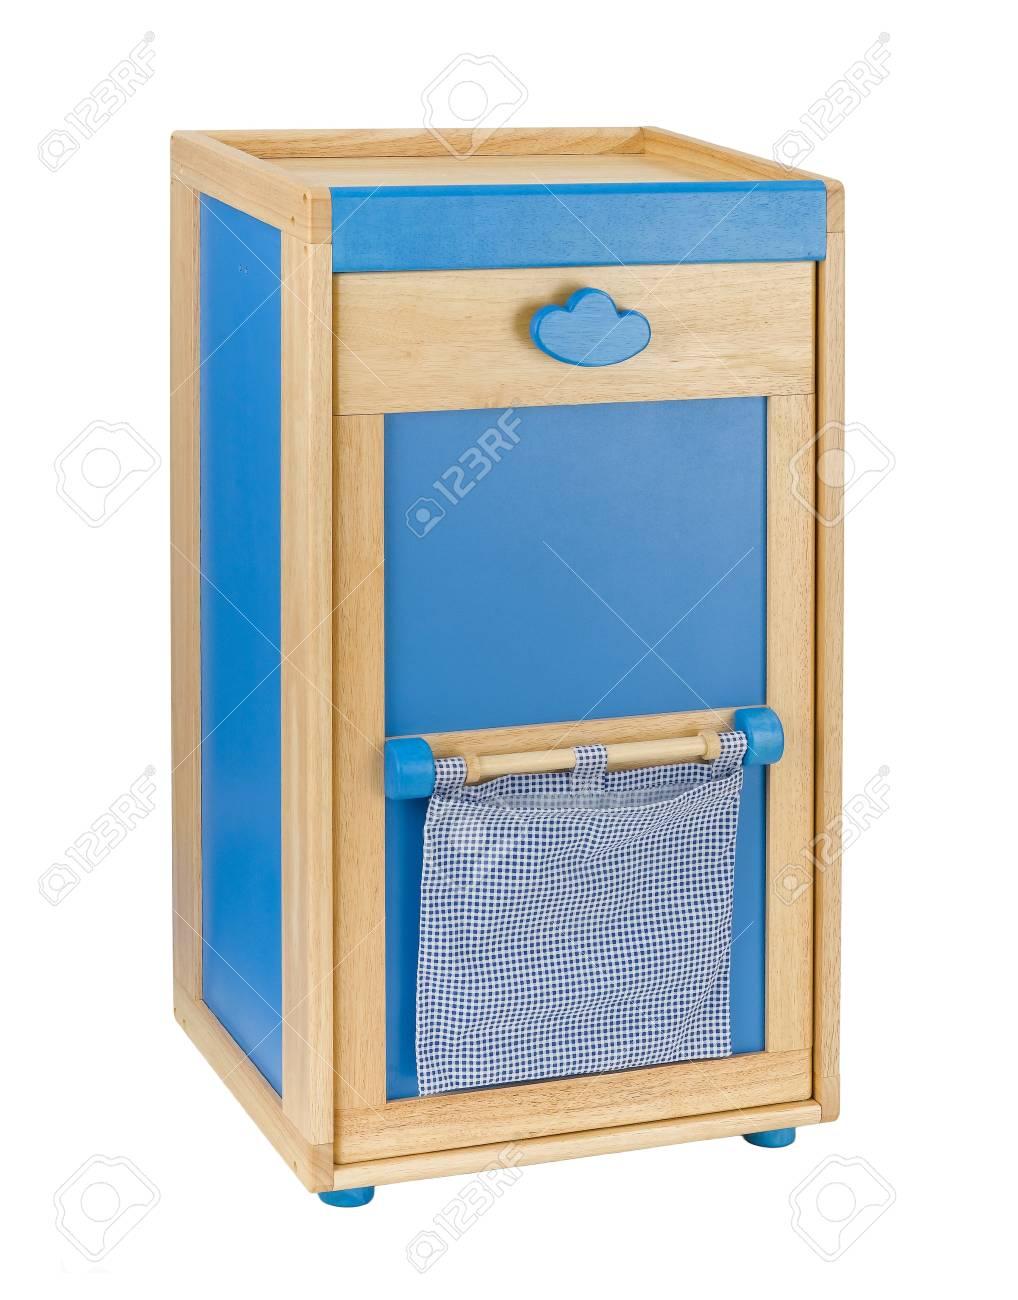 Mueble De Madera Para Los Ni Os A Mantener All Los Juguetes O  # Muebles Juguetes Para Ninos